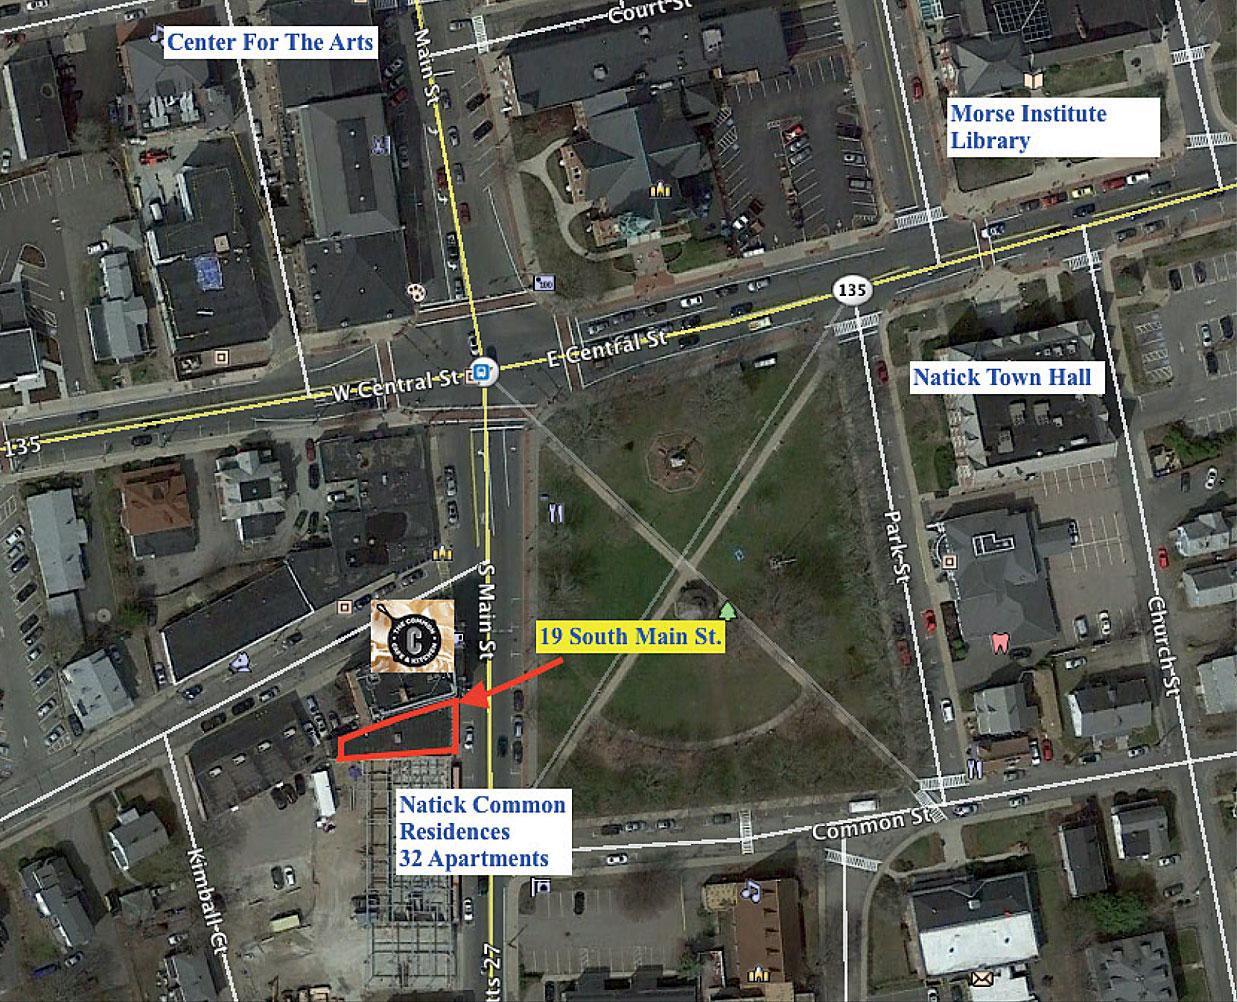 Retail Real Estate Advisors - Property - 19 South Main Street, Natick, MA